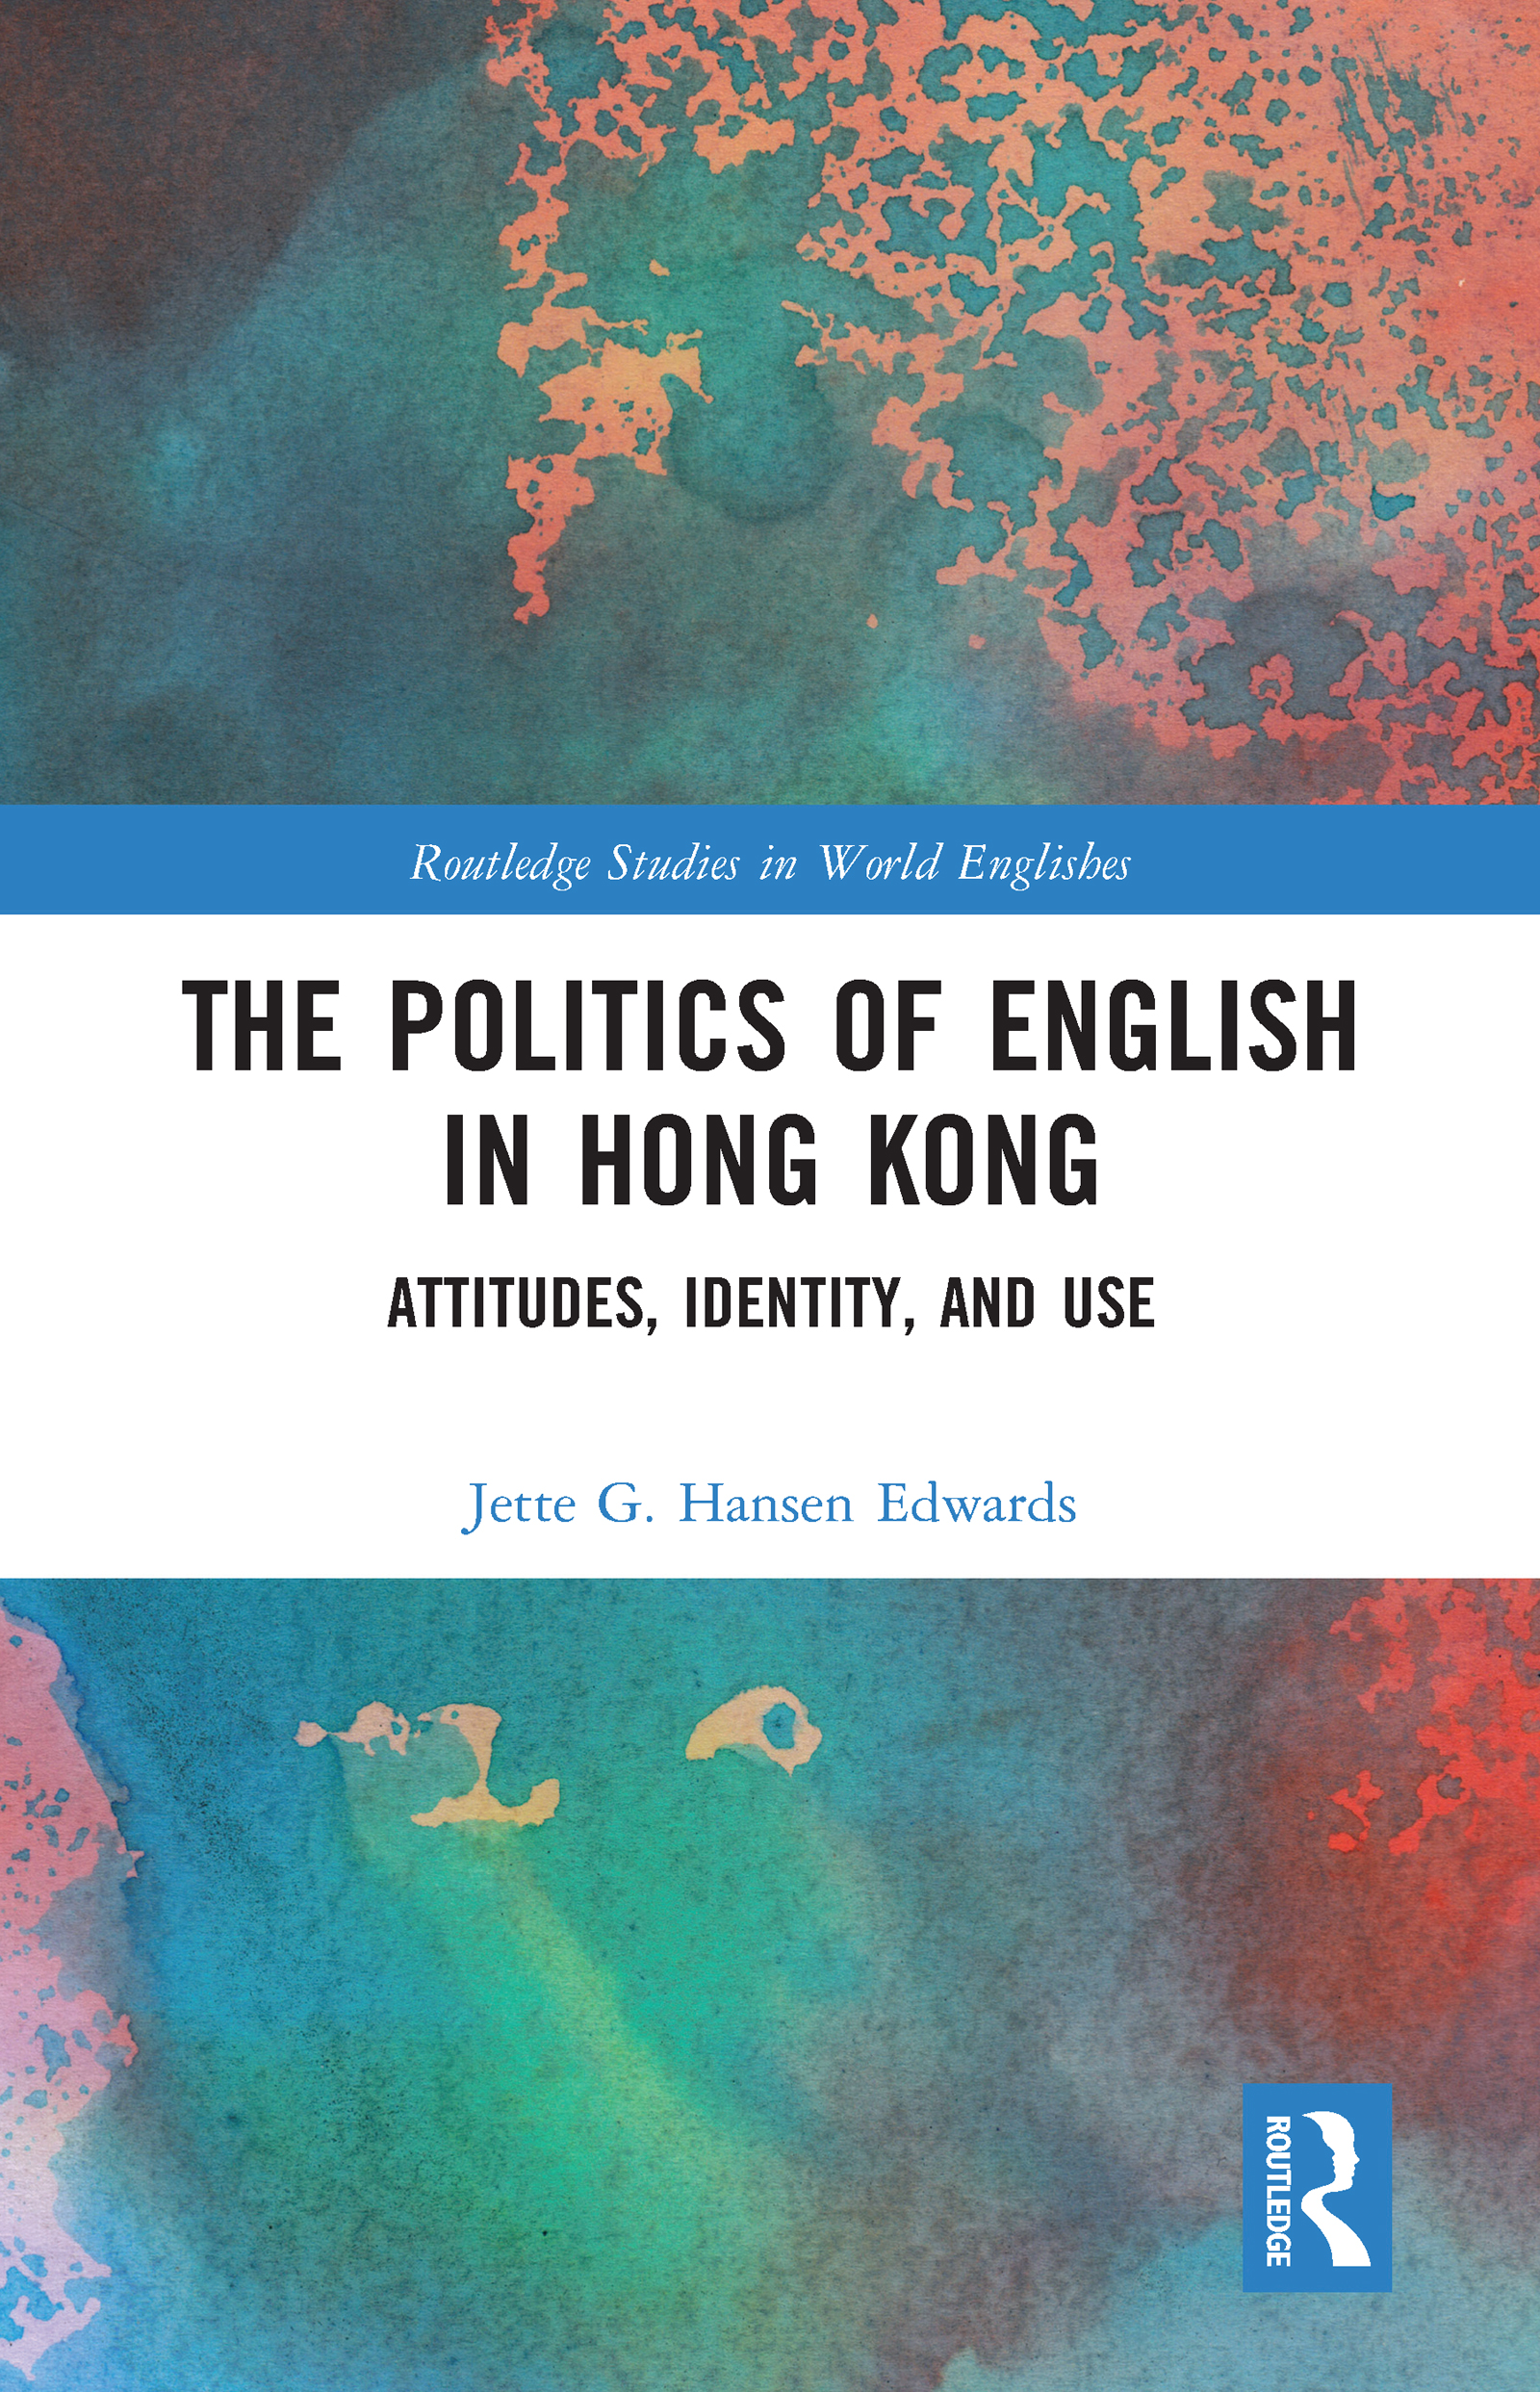 The Politics of English in Hong Kong